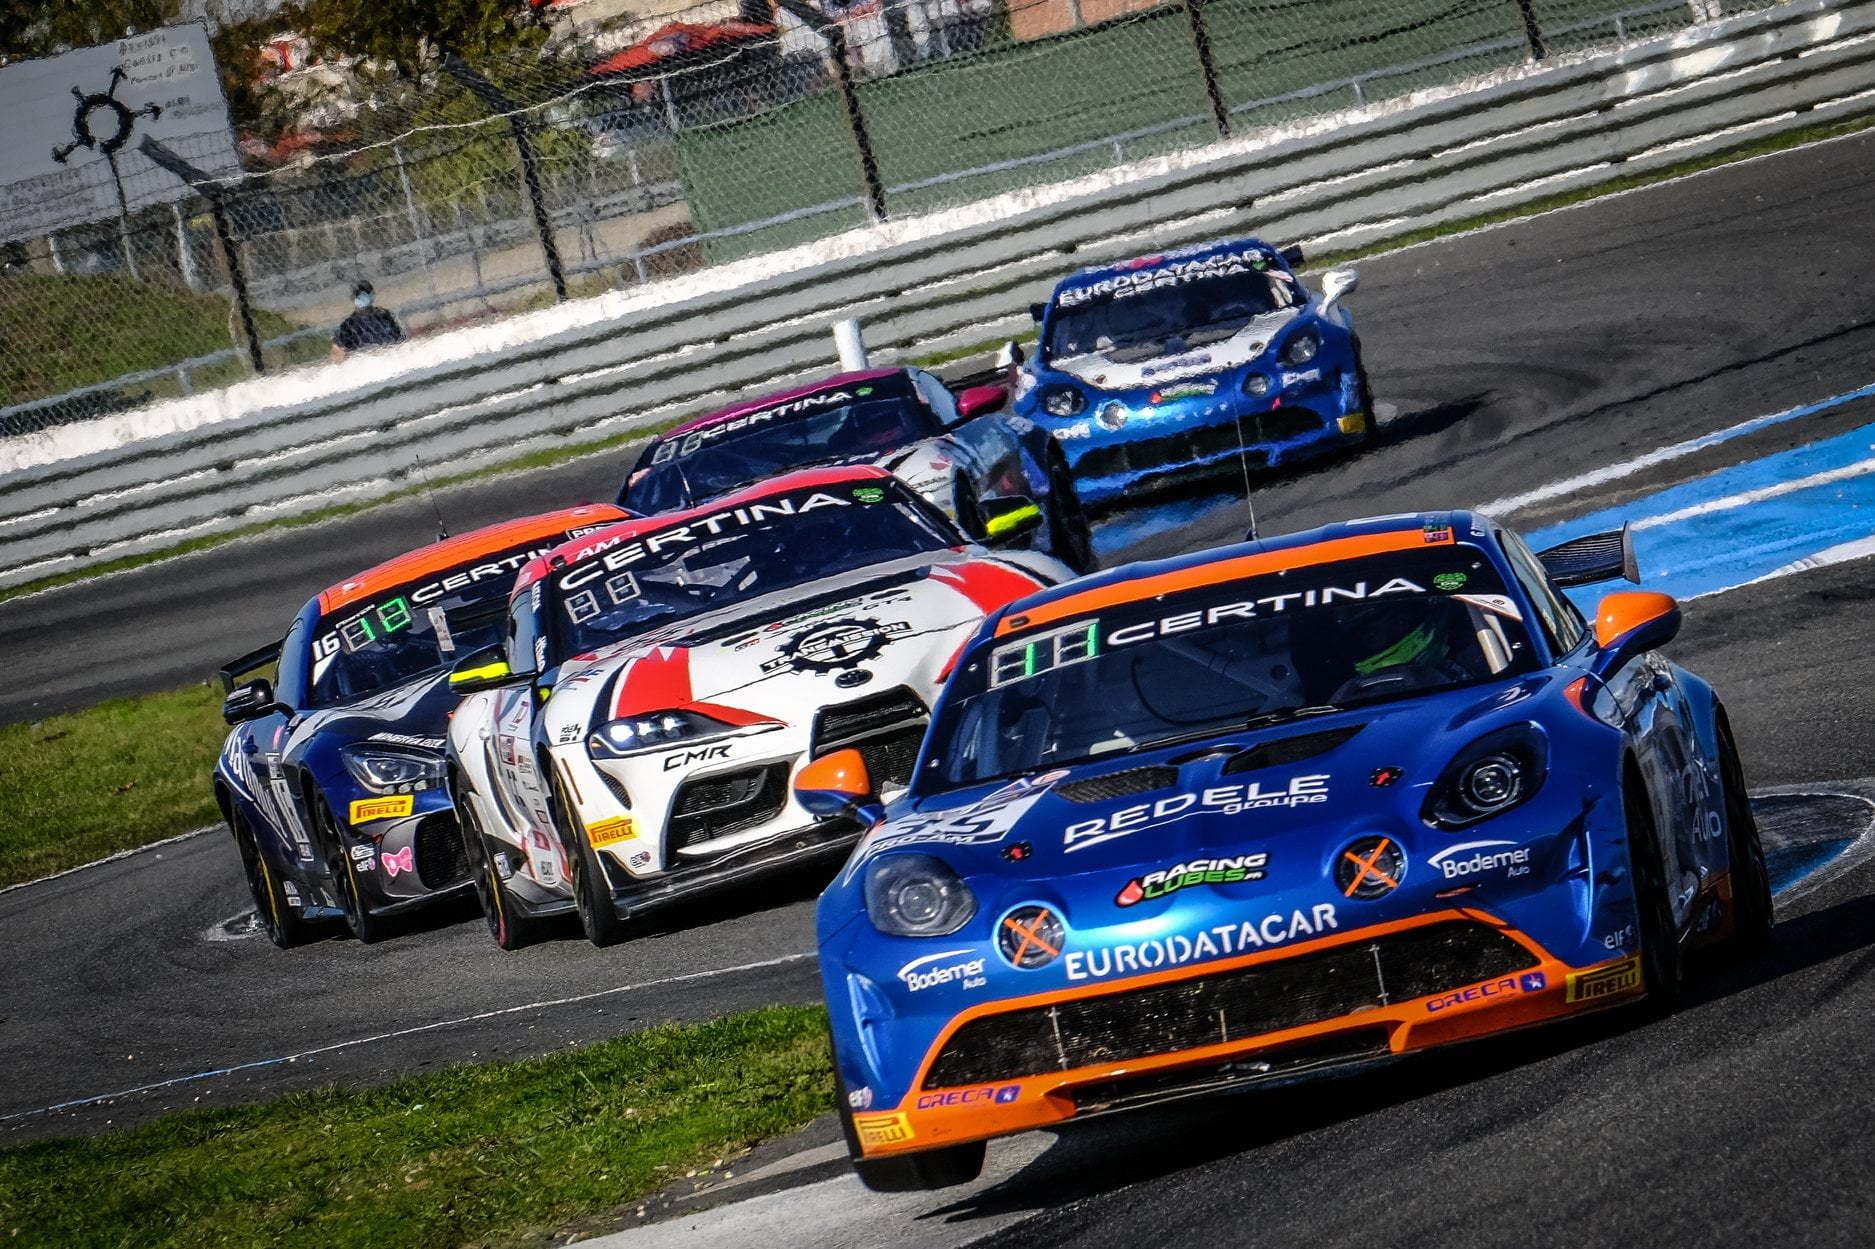 Alpine A110 GT4 FFSA GT 2020 Albi Course 2 2 | Alpine A110 GT4 : Herrero et Moullin-Traffort performent à Albi !